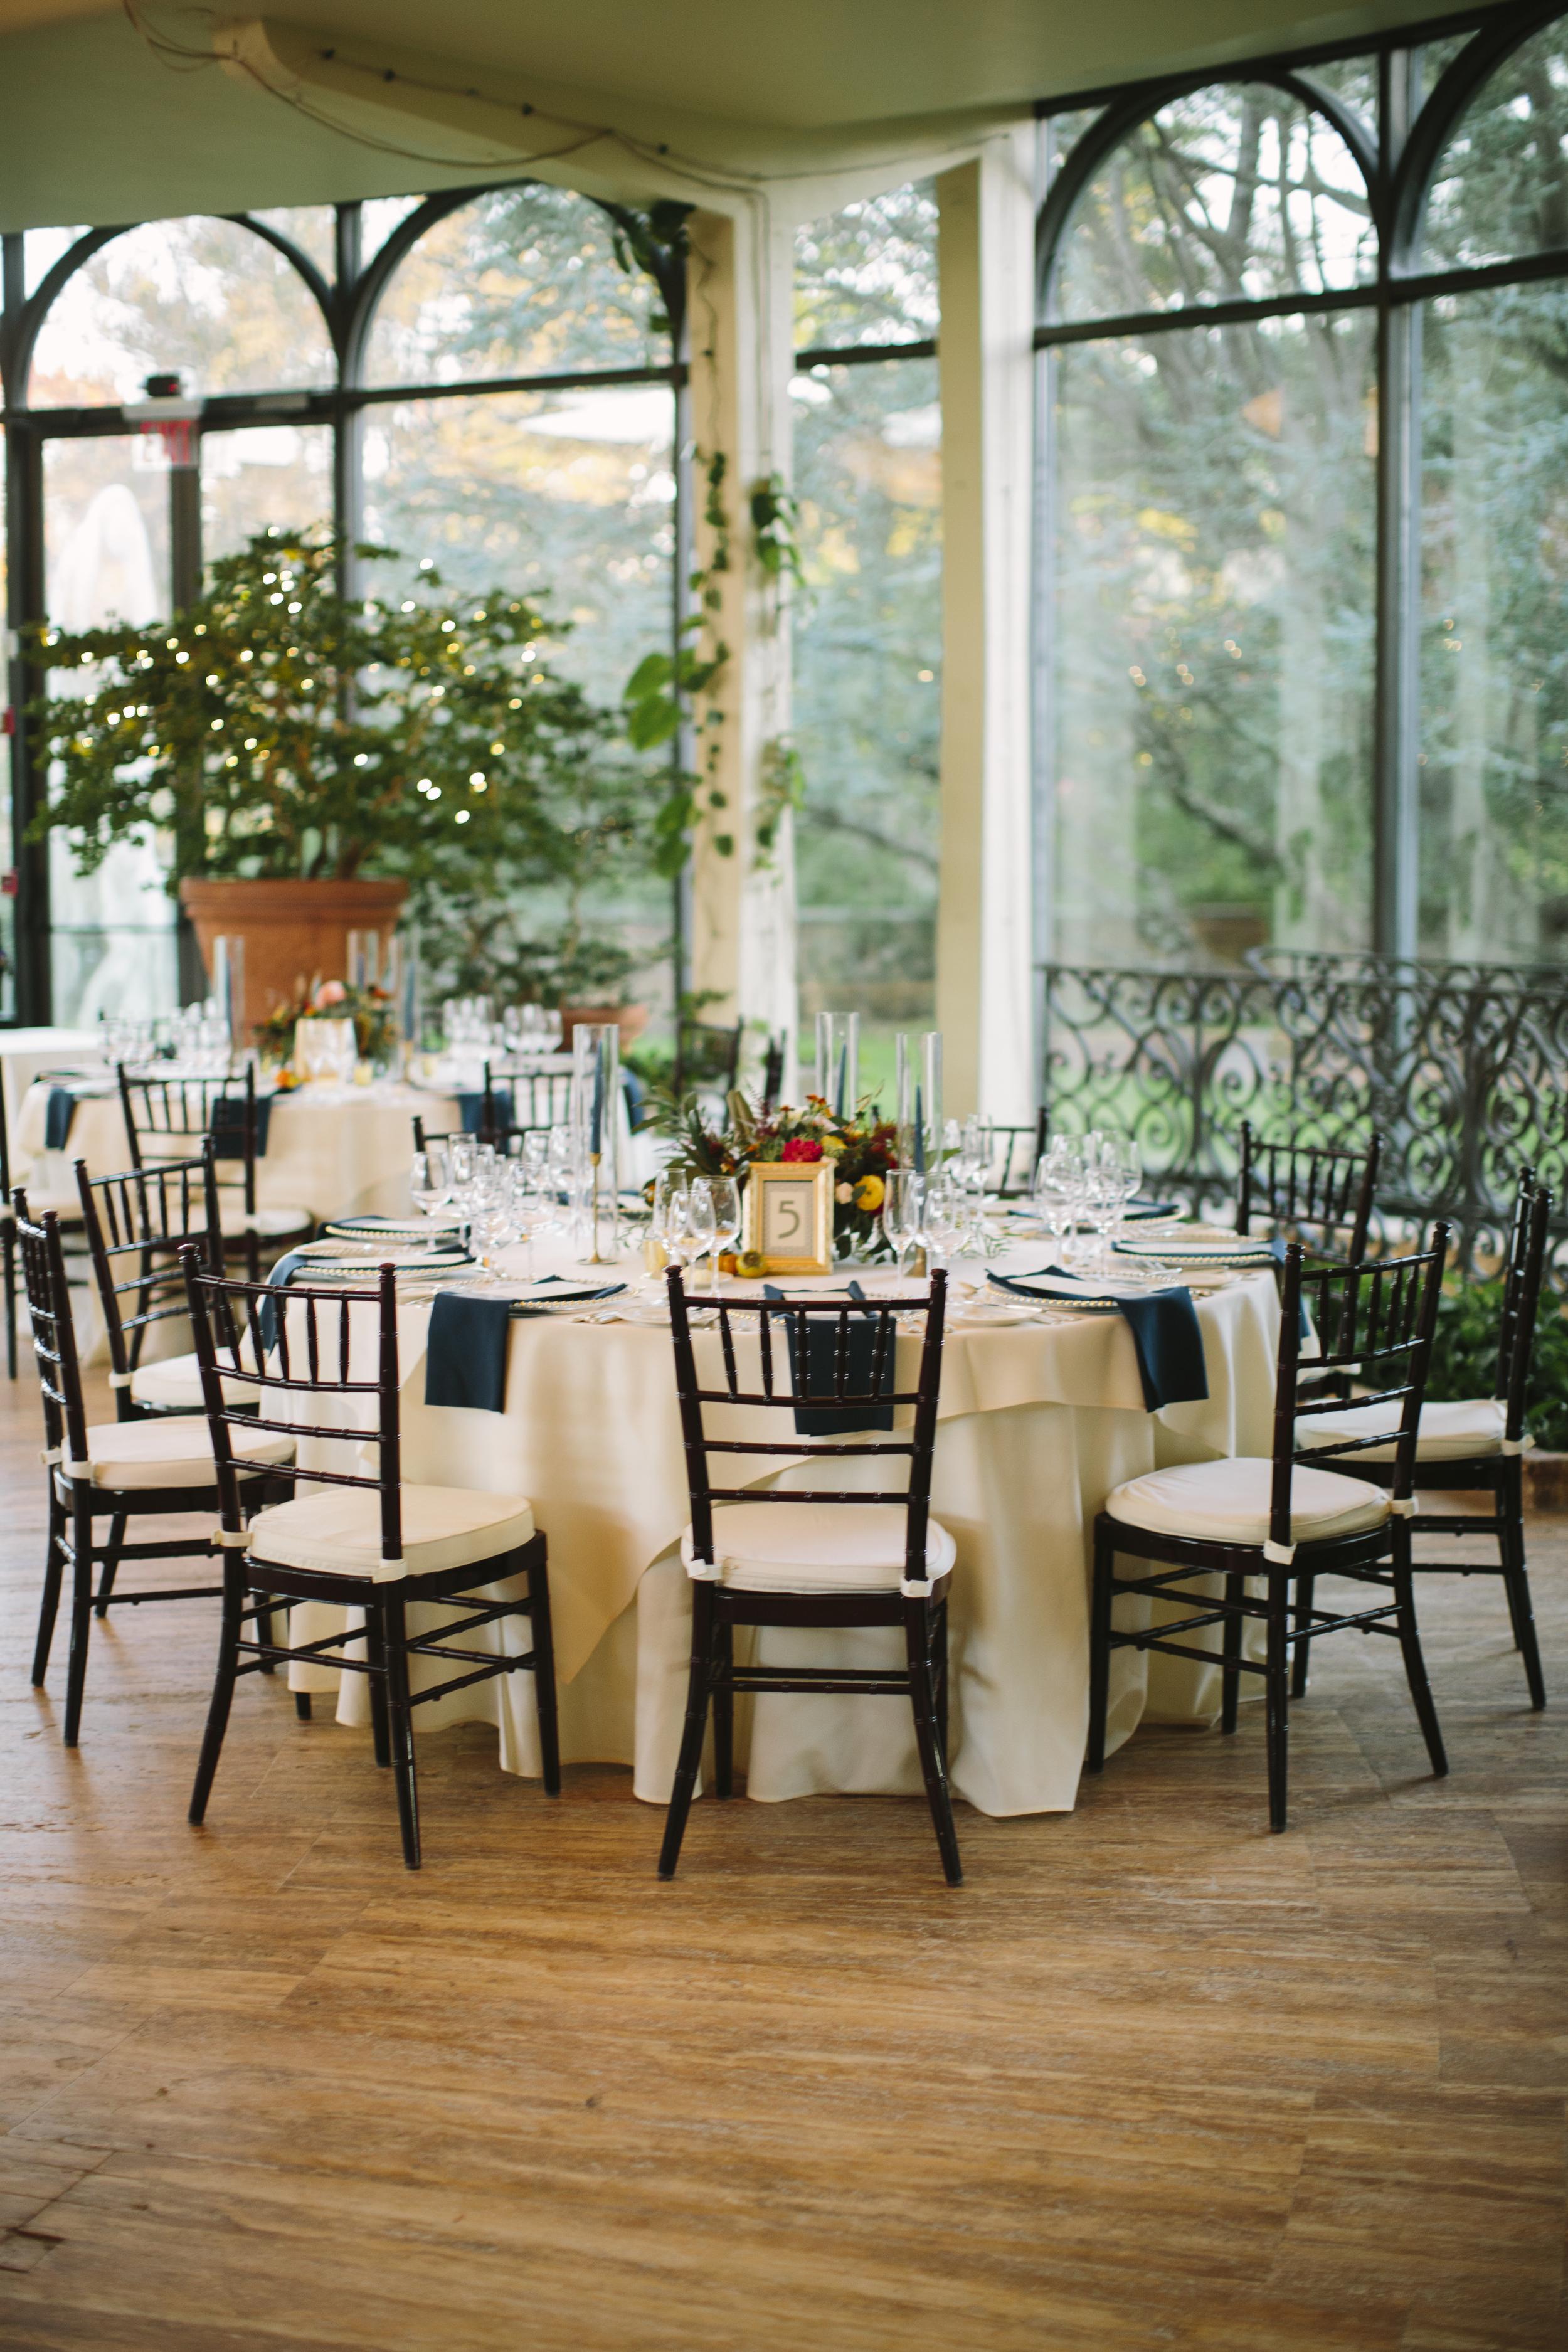 A Garden Party Florist, Jasna Polana, Saltwater Studios Photography, Wild, Table Decor